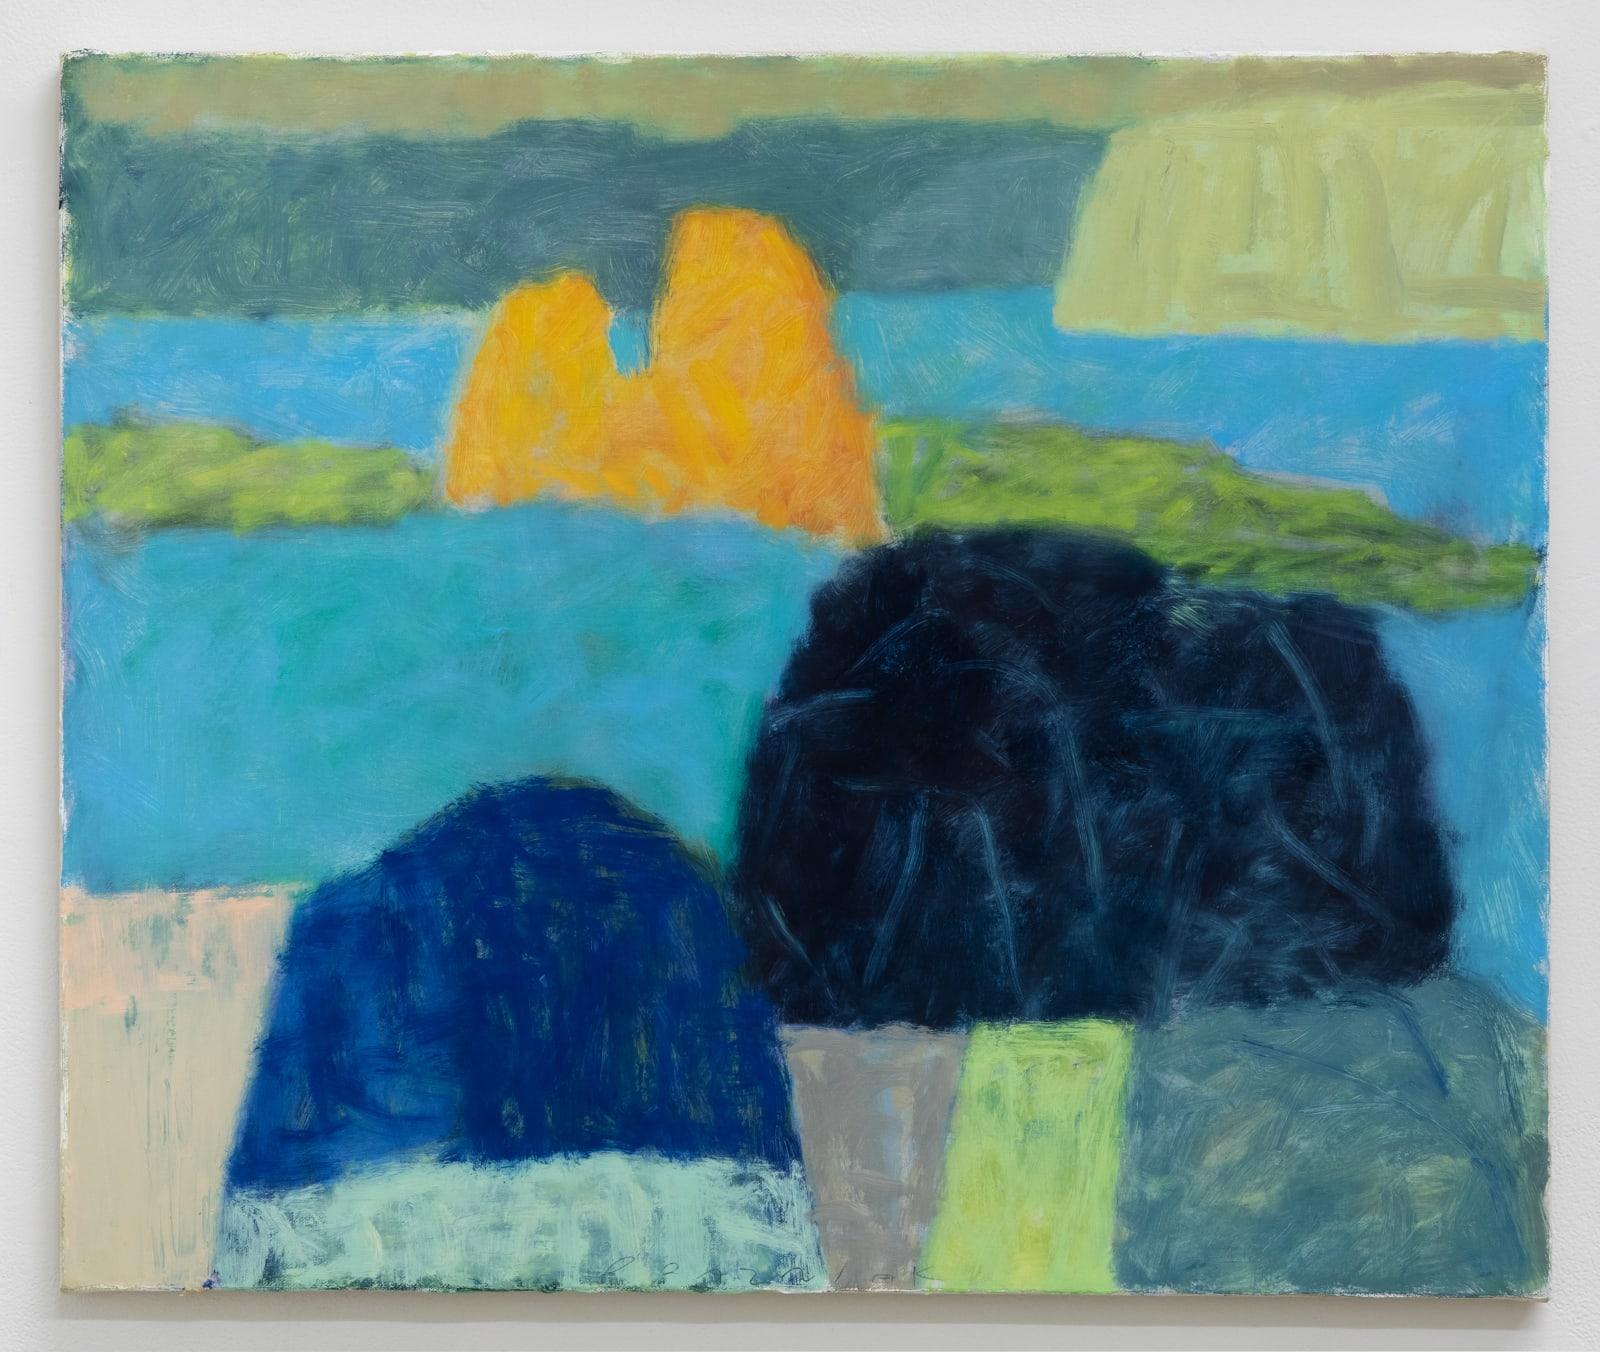 Alan Prazniak, James River, 2021